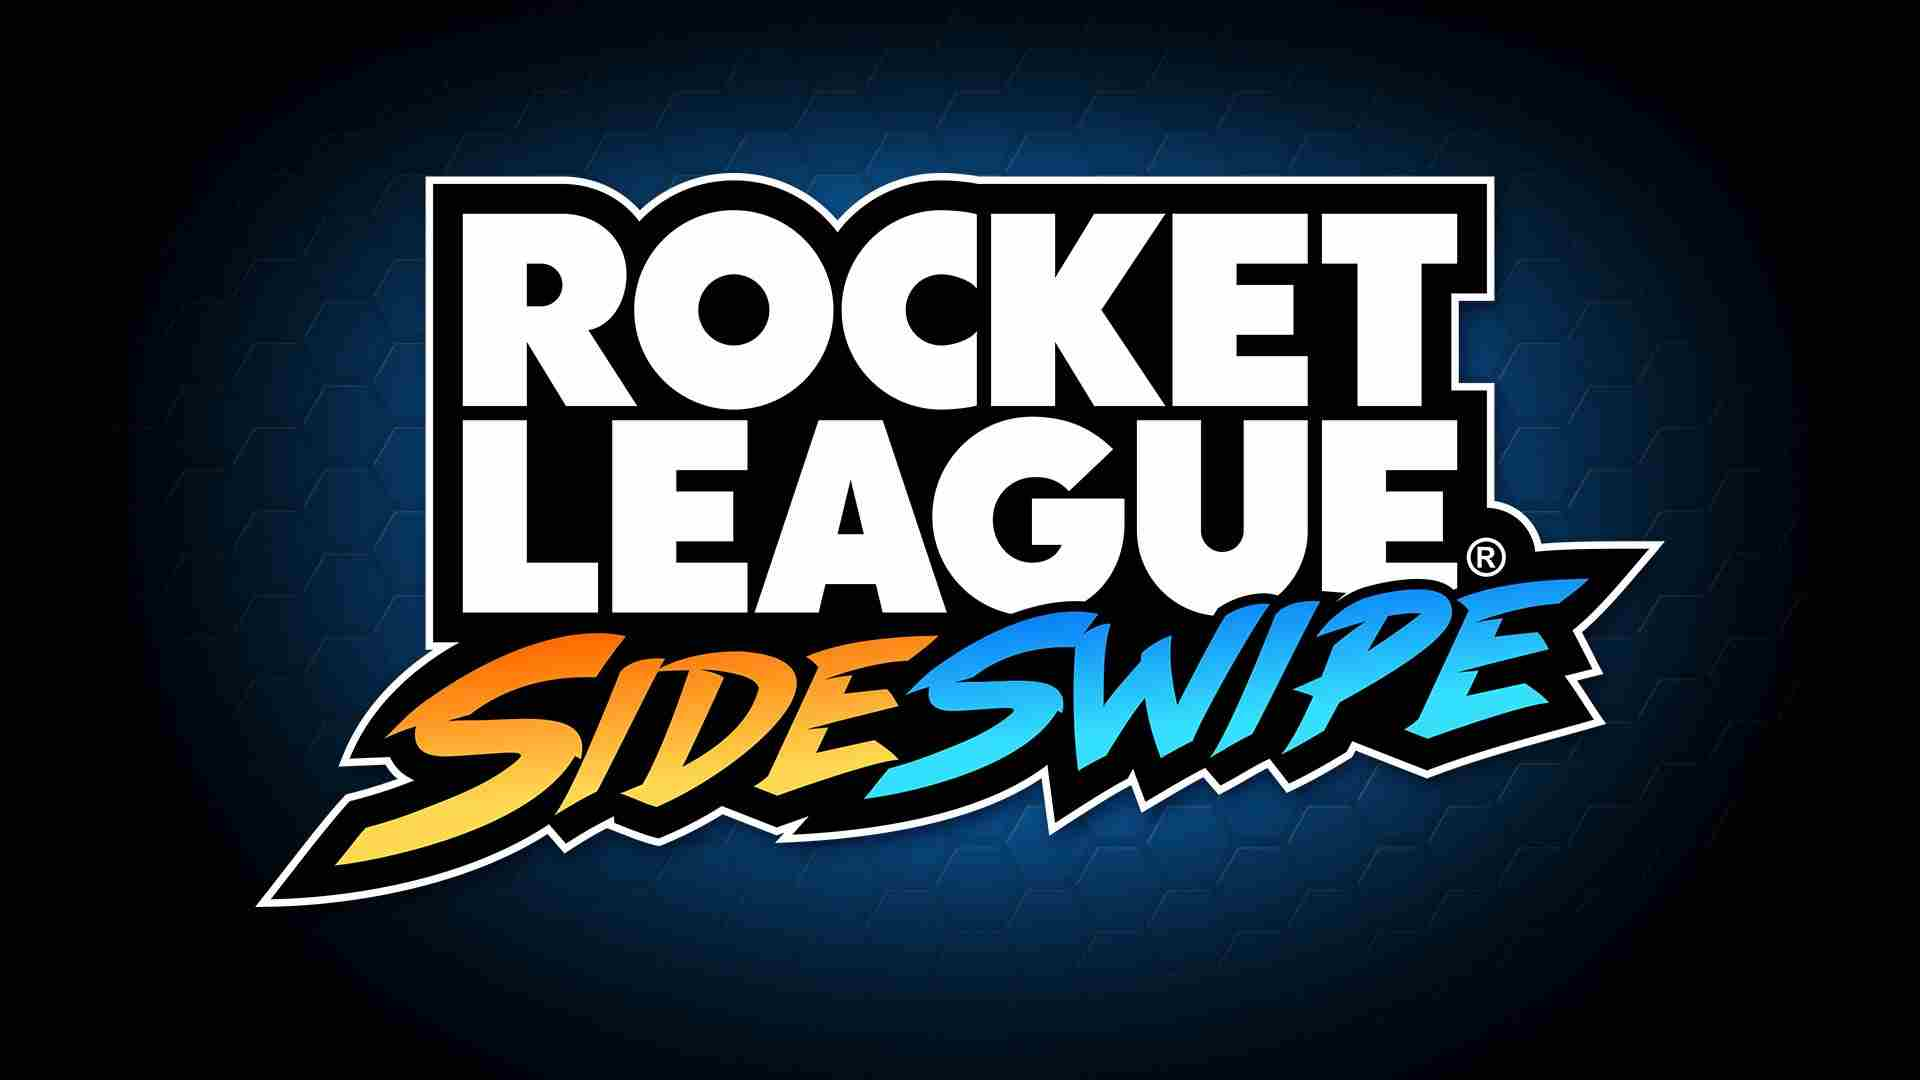 Rocket League SideSwipe Mobile Version